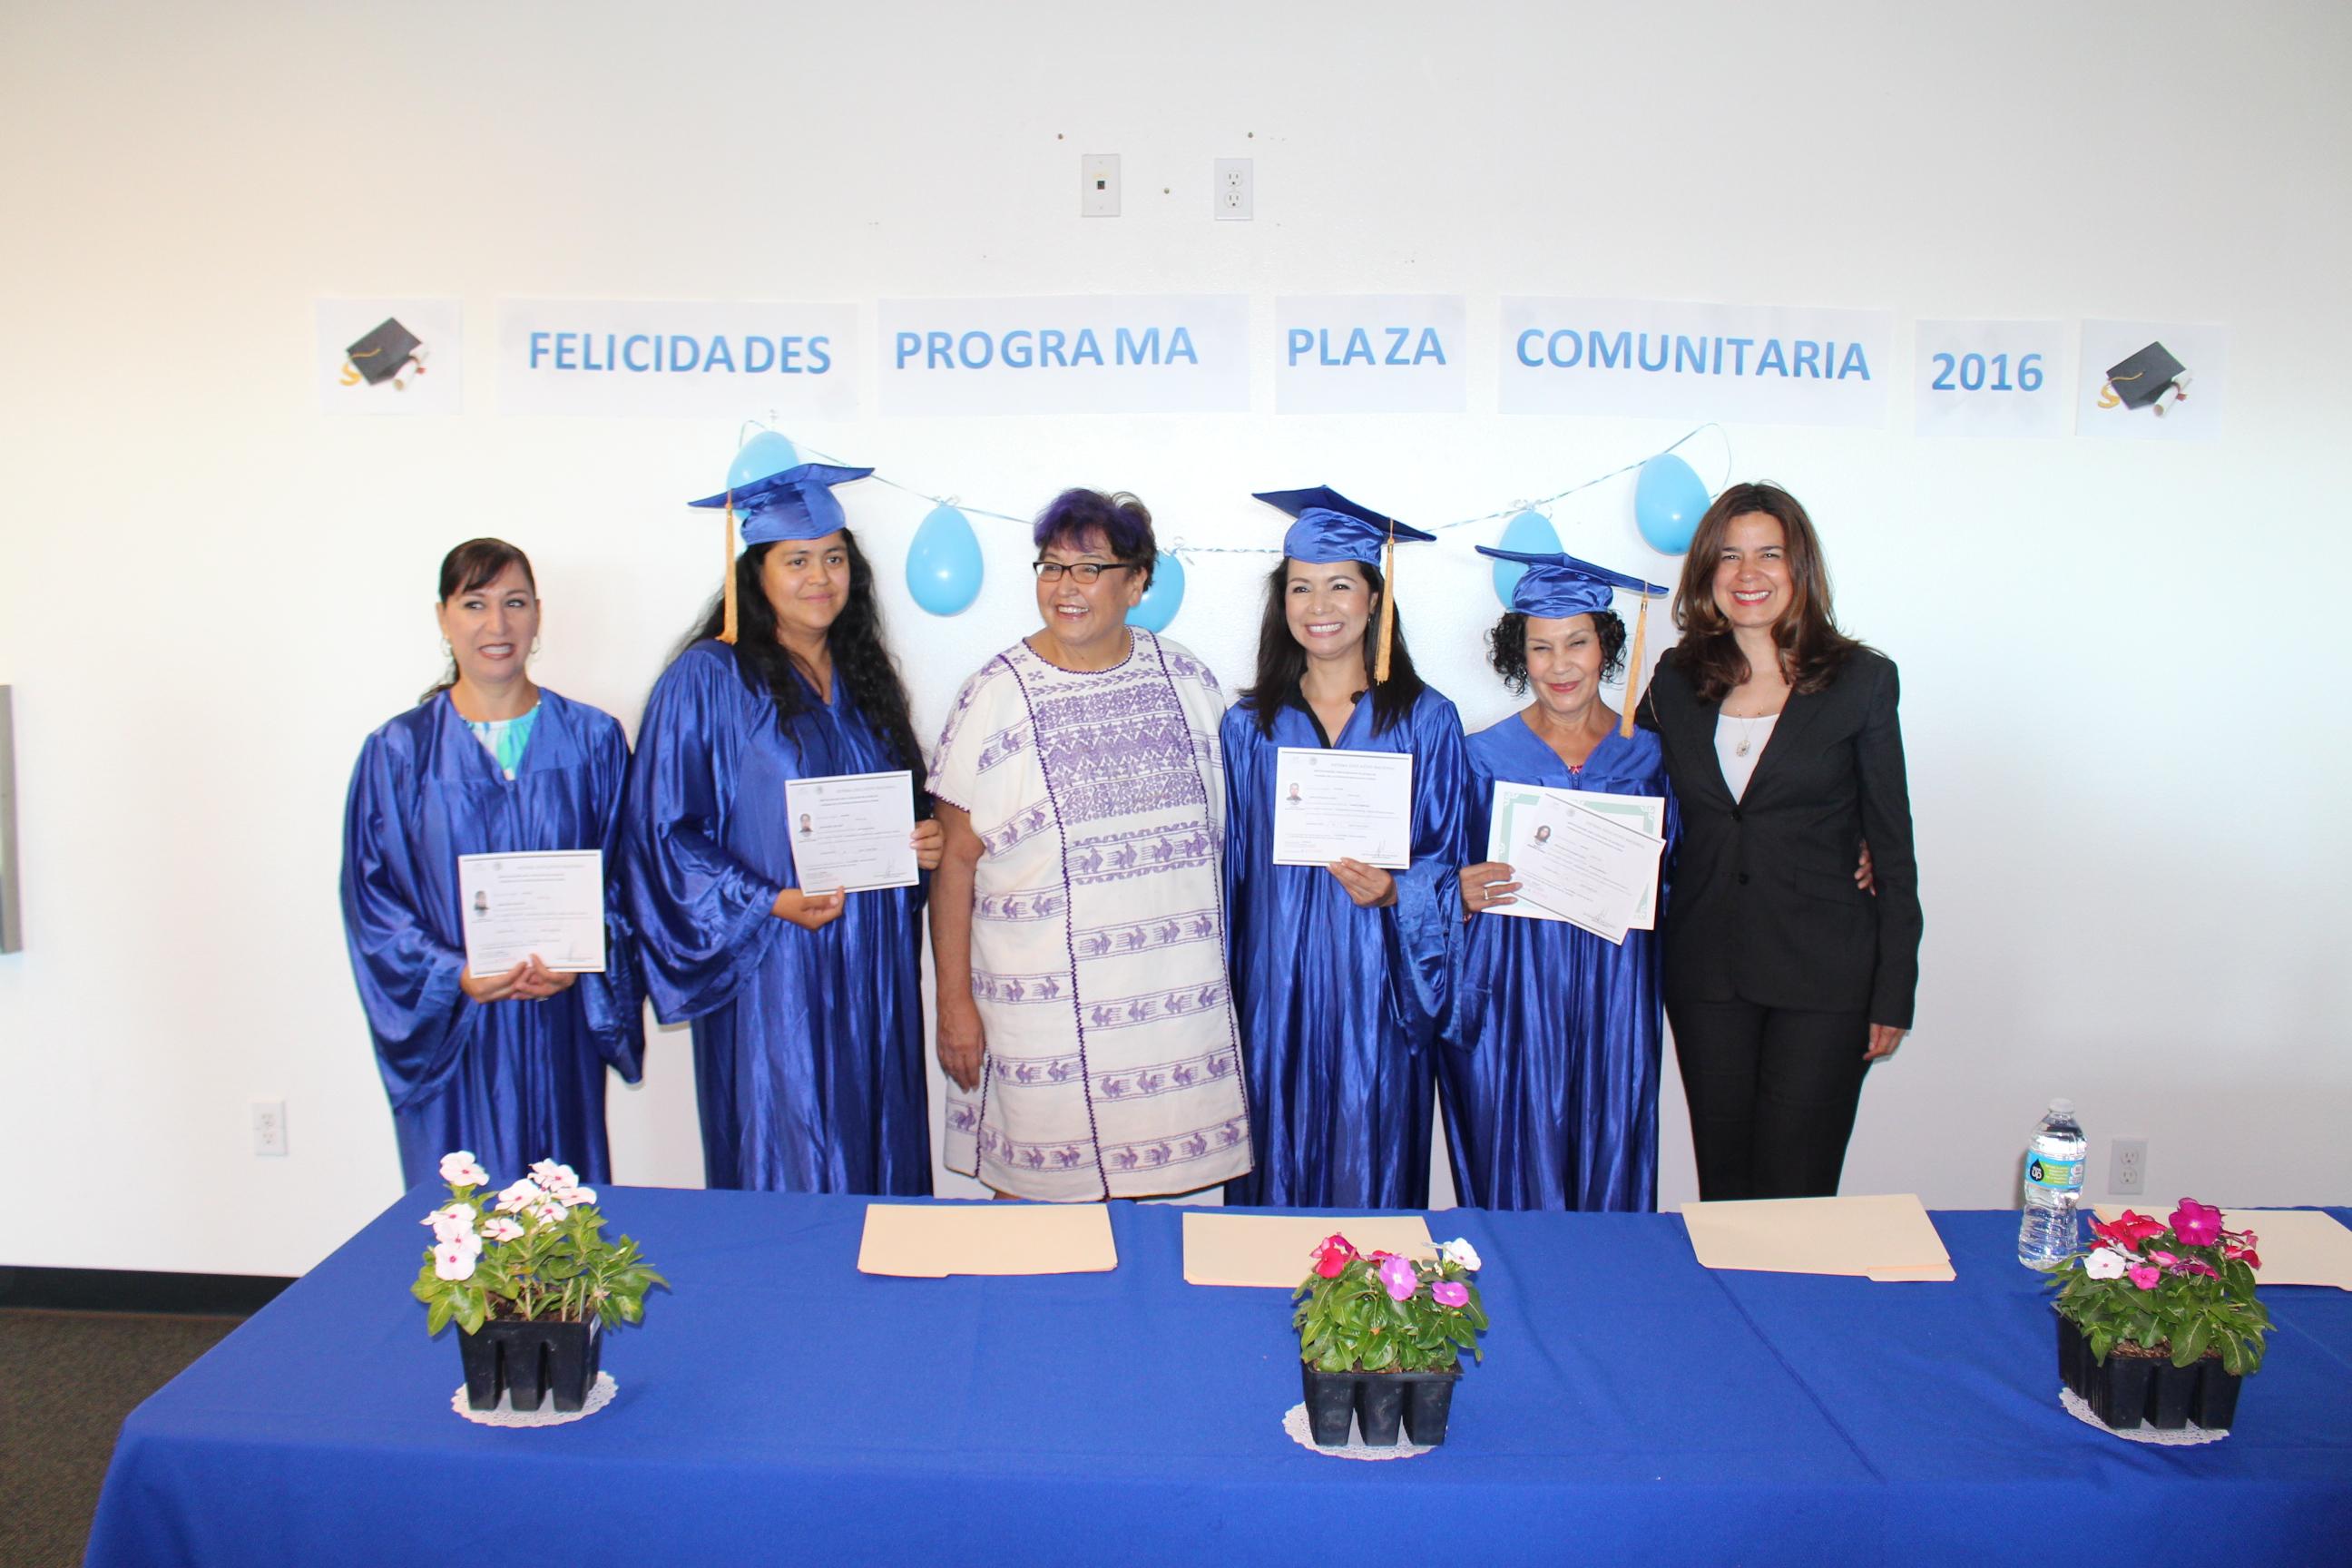 Cónsul de México en San Diego entrega certificados de estudio en Casa Familiar